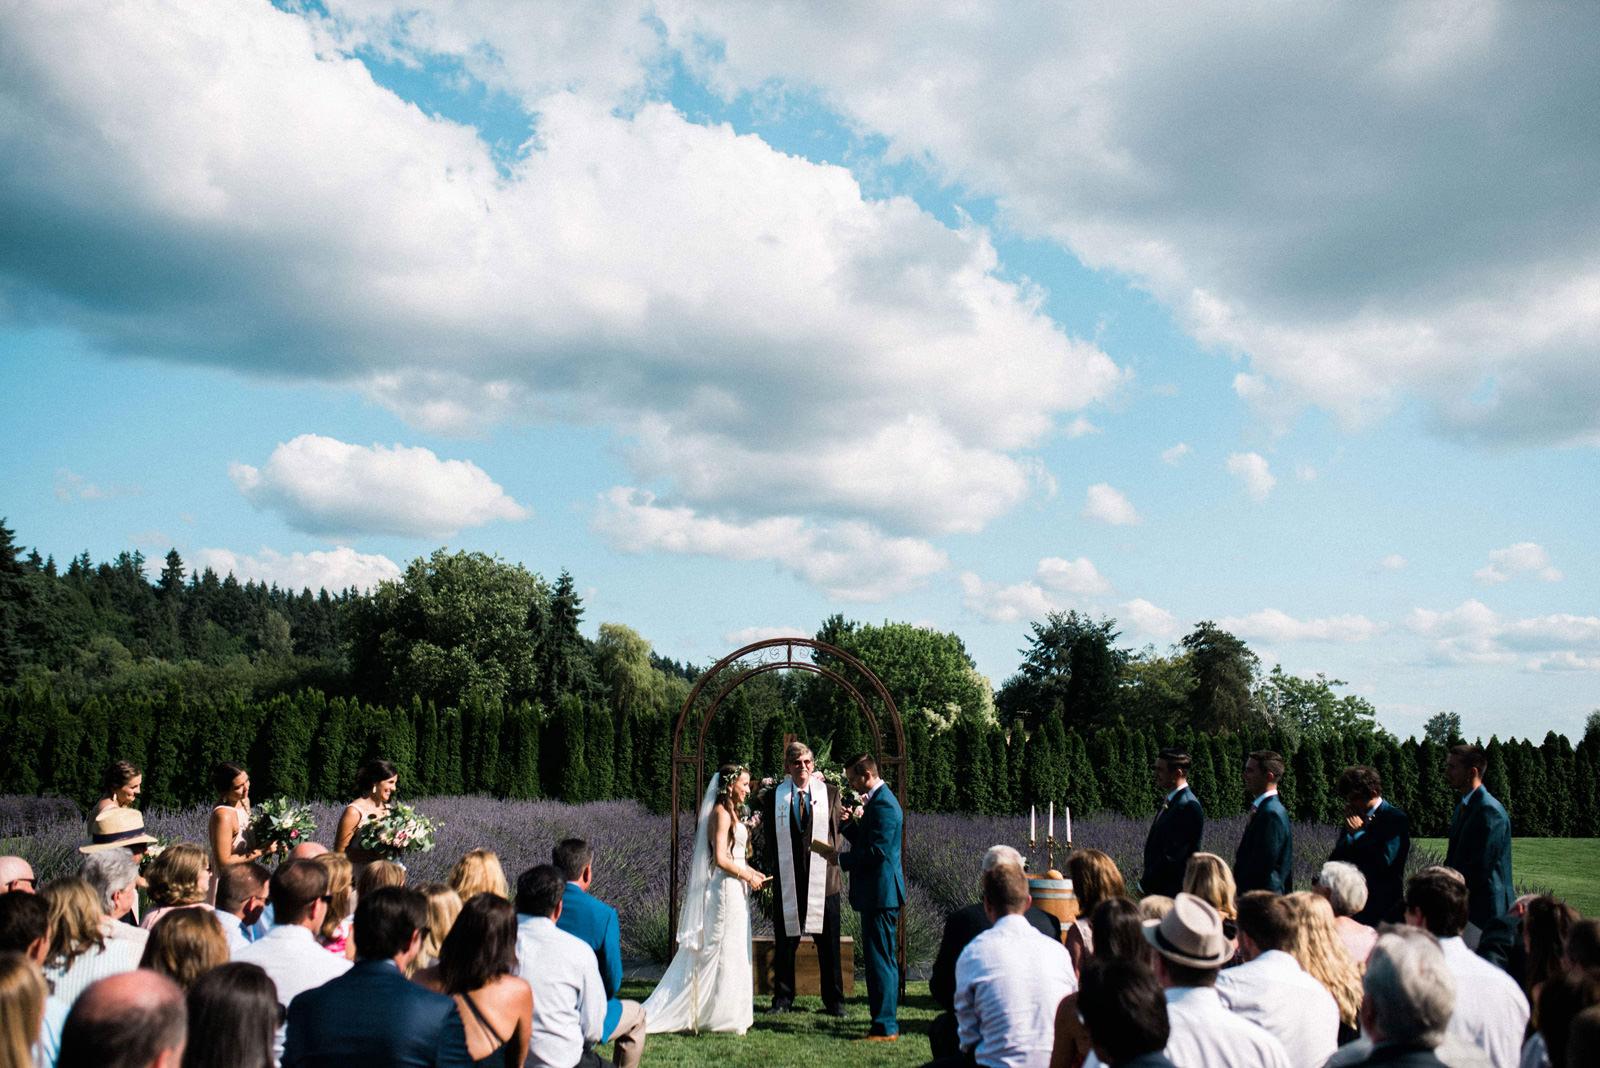 040-woodinville-lavendar-farm-wedding-with-golden-glowy-photos.jpg